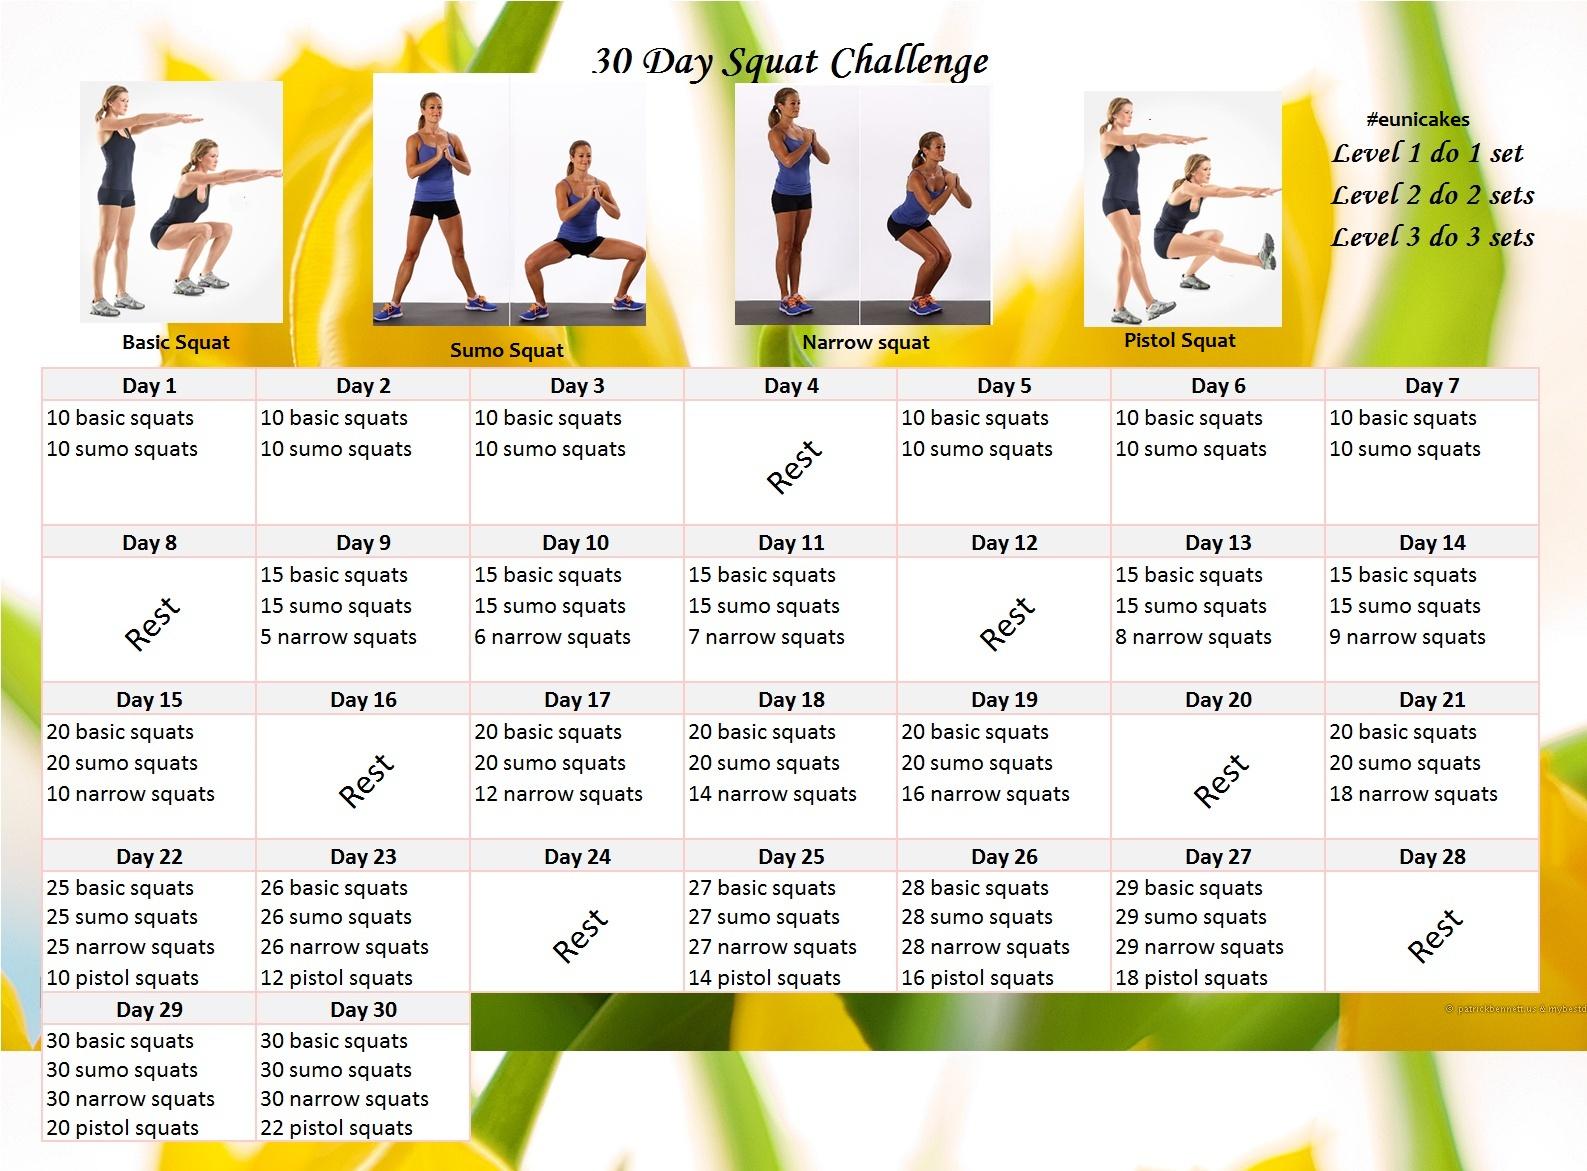 Fitness Challenge: 30 Day Squat Calendar Challenge | Eunicakes With Regard To 30 Days Squat Challenge Calendar